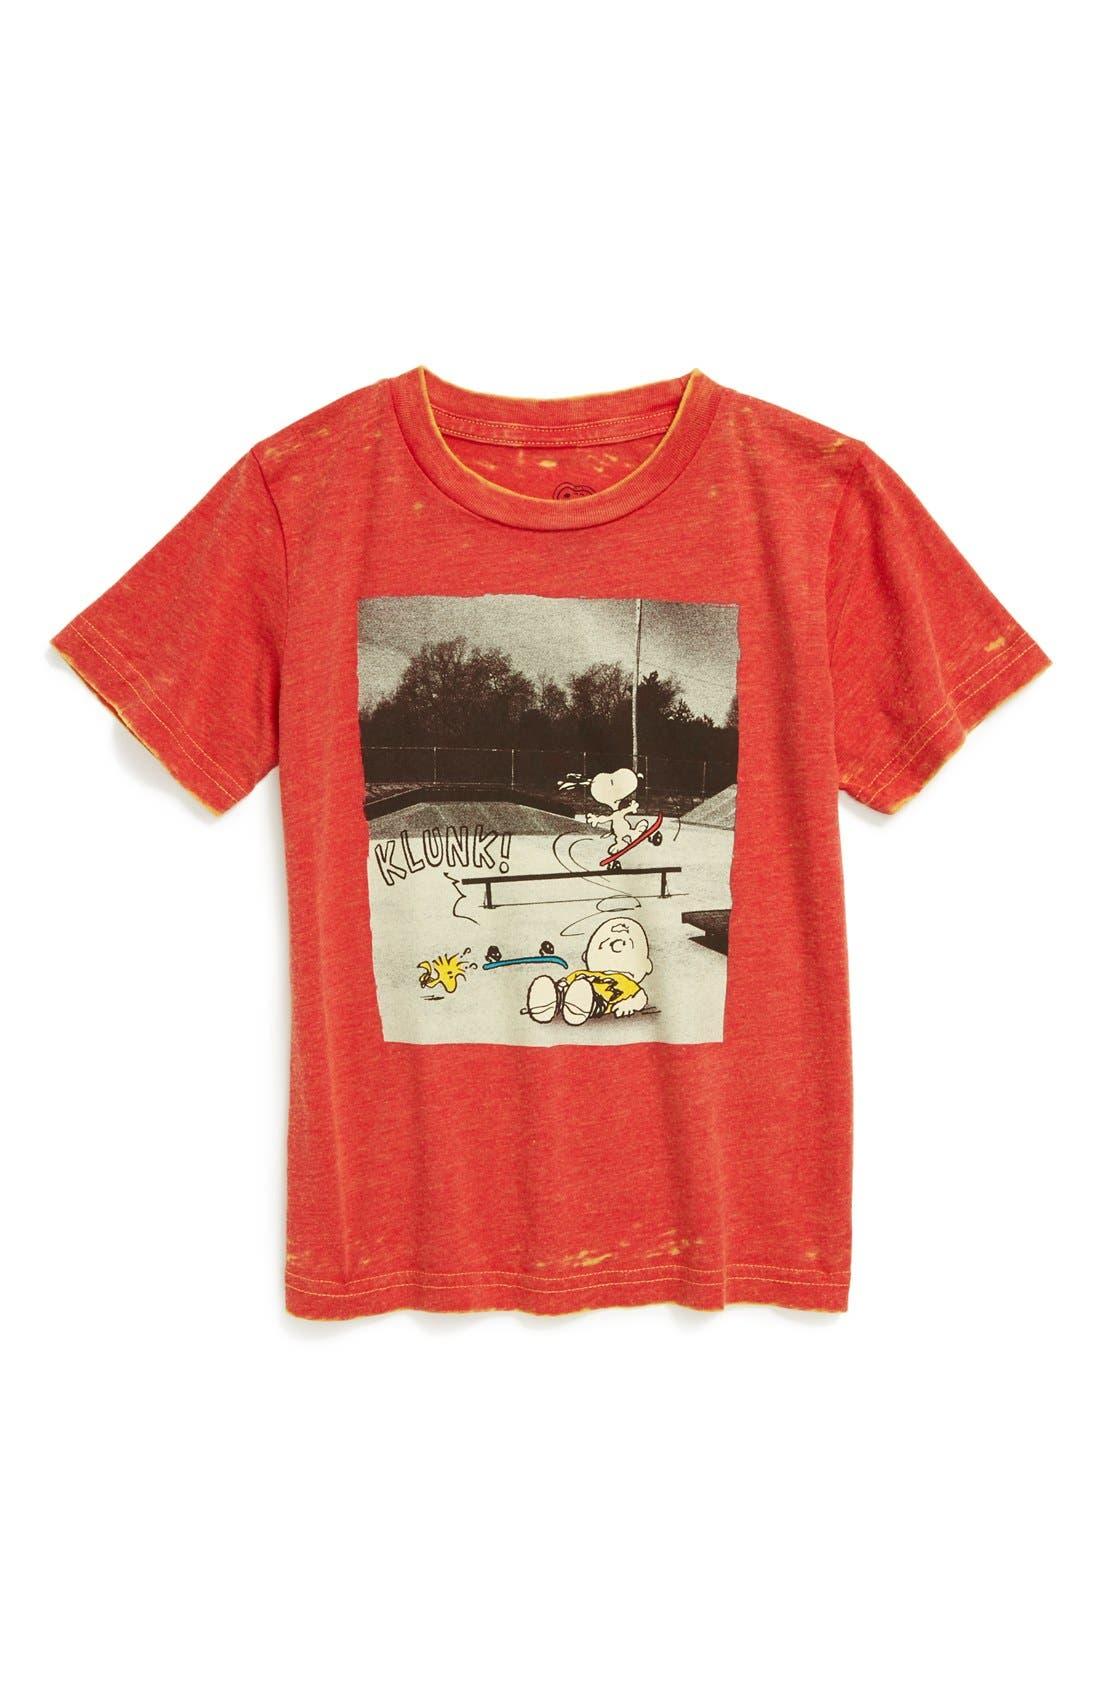 Main Image - Jem 'Charlie Brown™' Graphic T-Shirt (Toddler Boys)